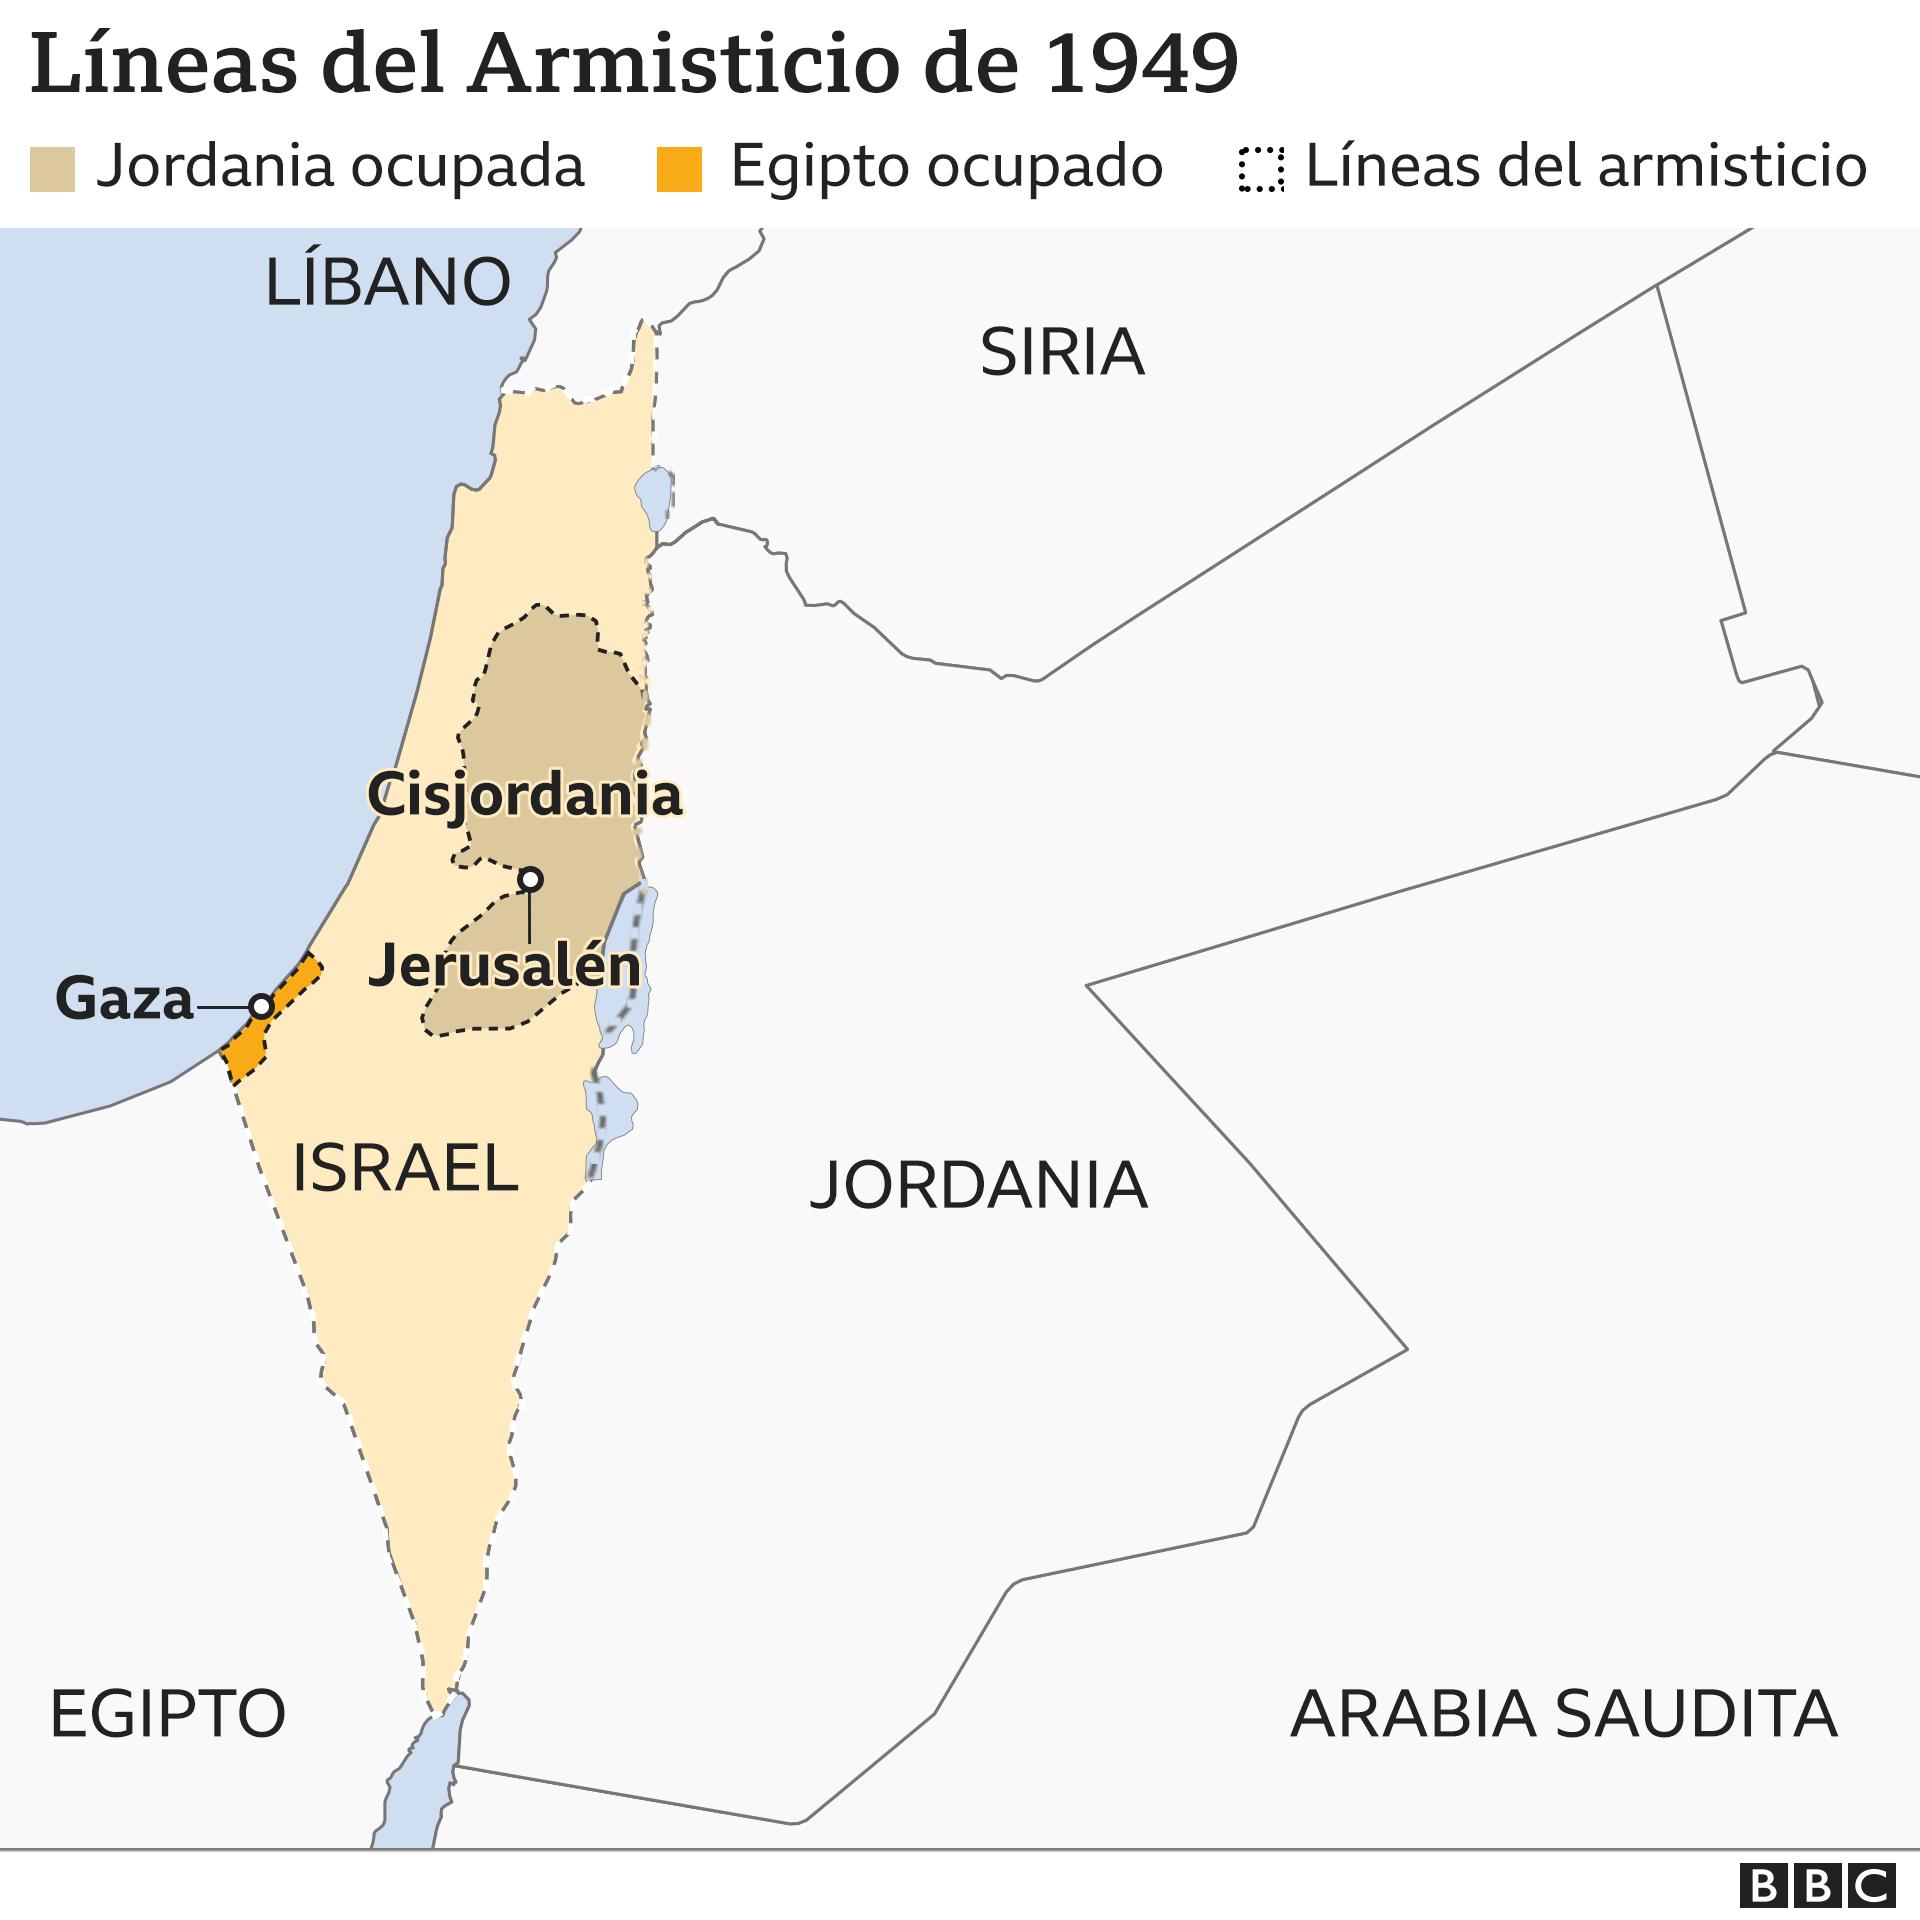 Mapa 3: Armisticio de 1949